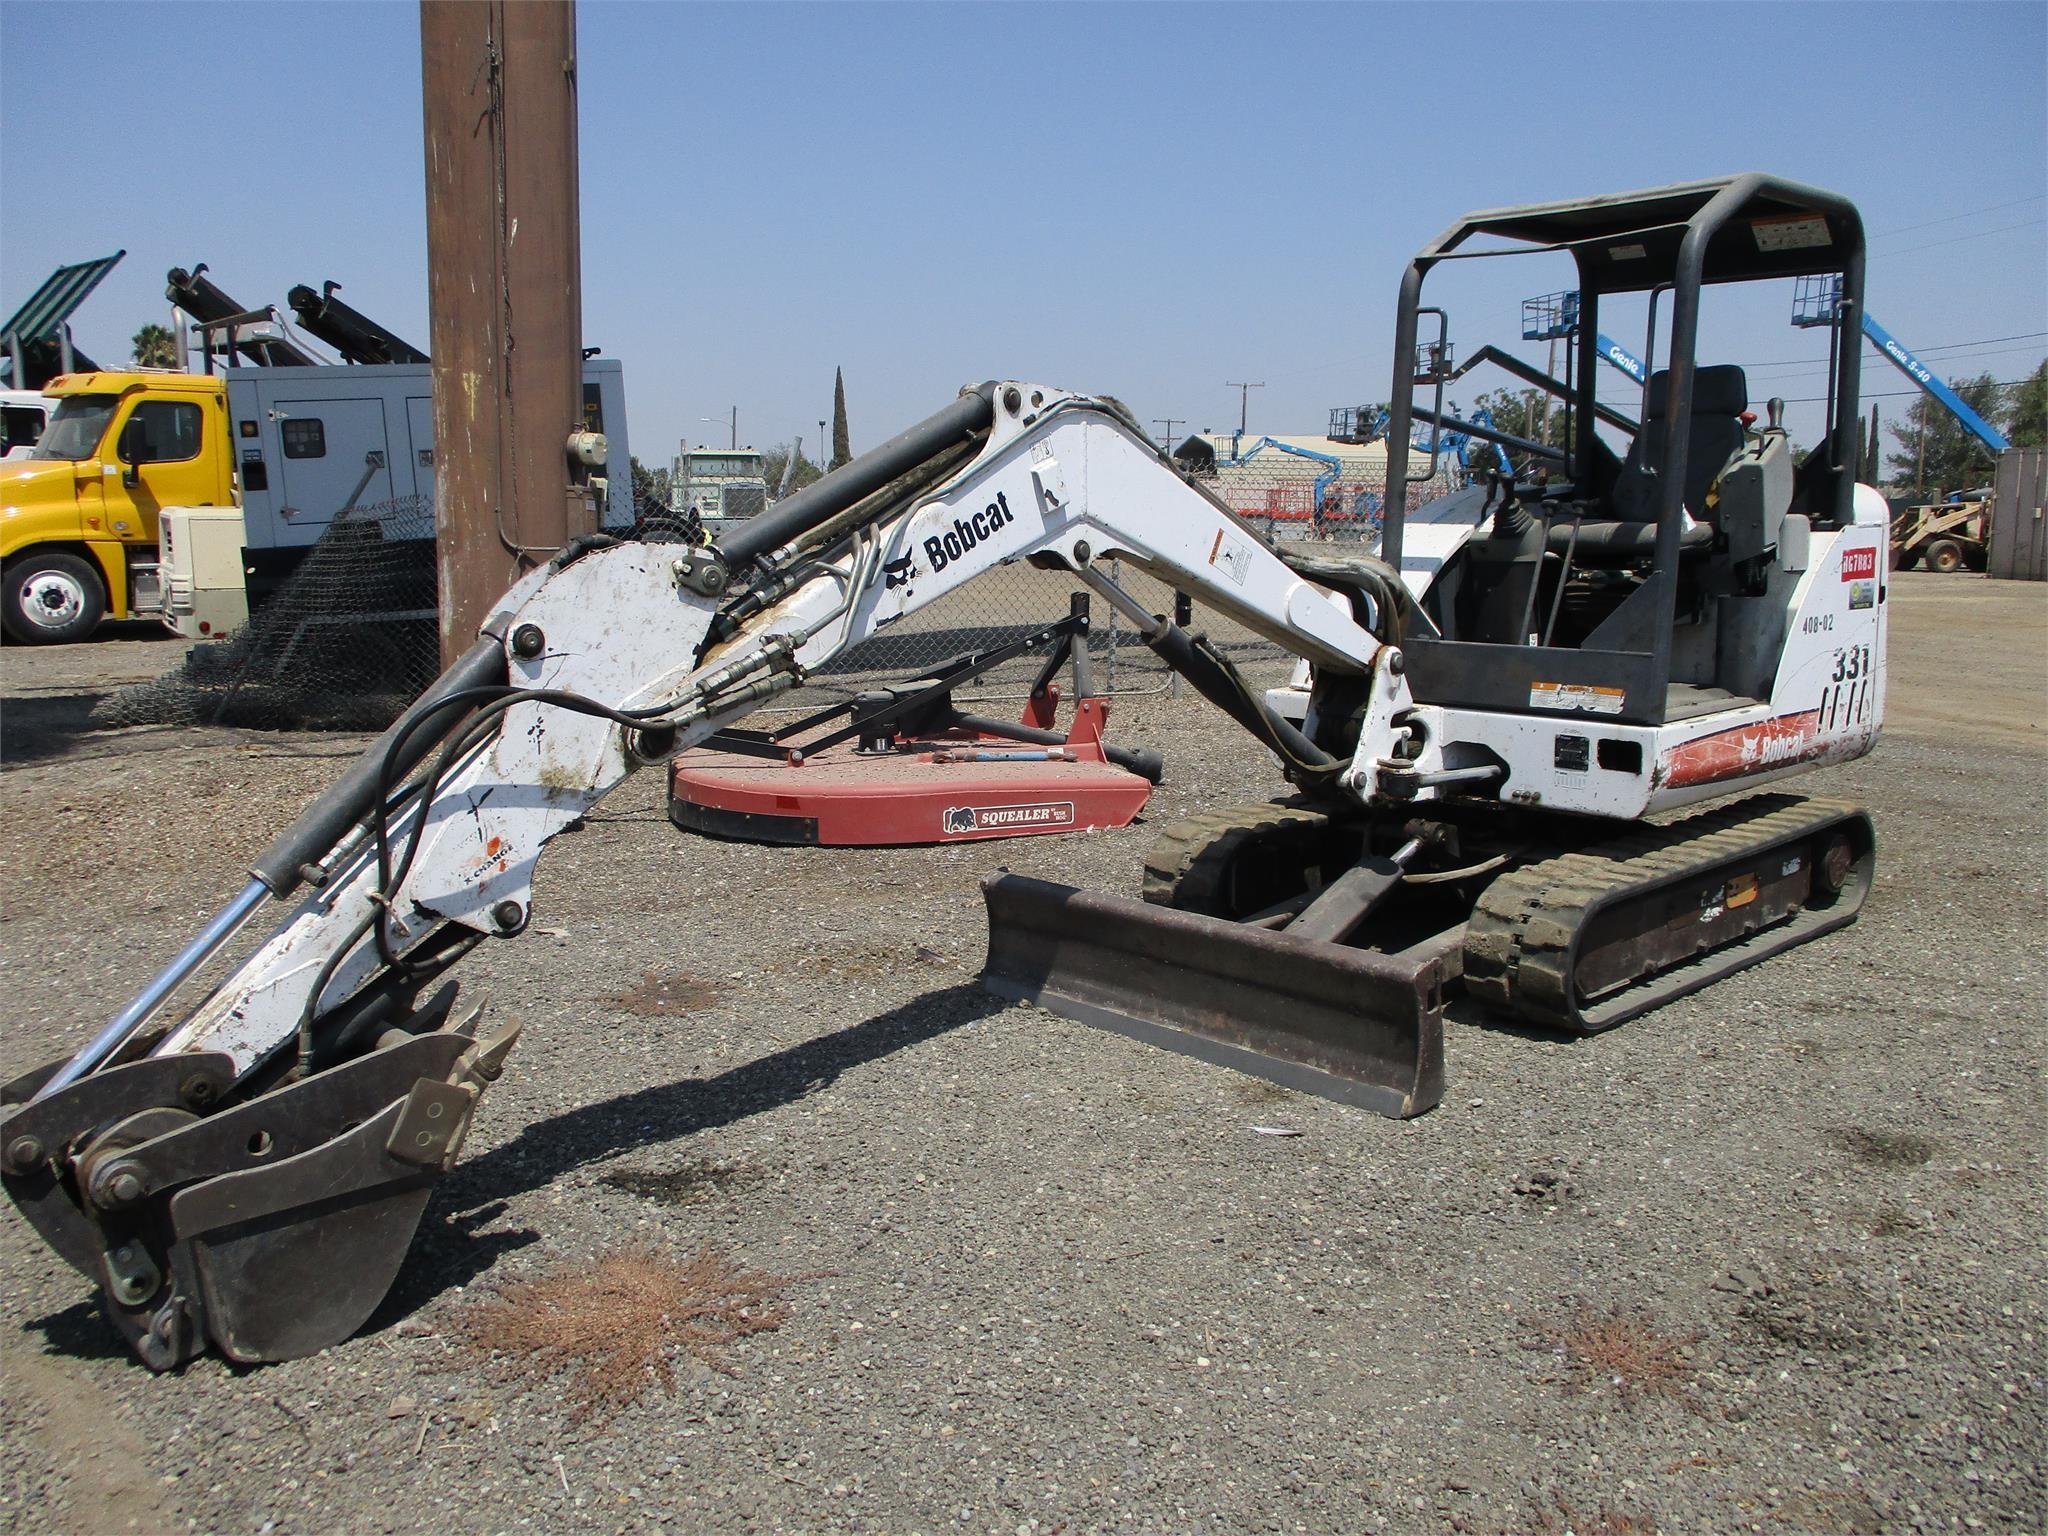 Bobcat 331 Excavators for Sale | CEG